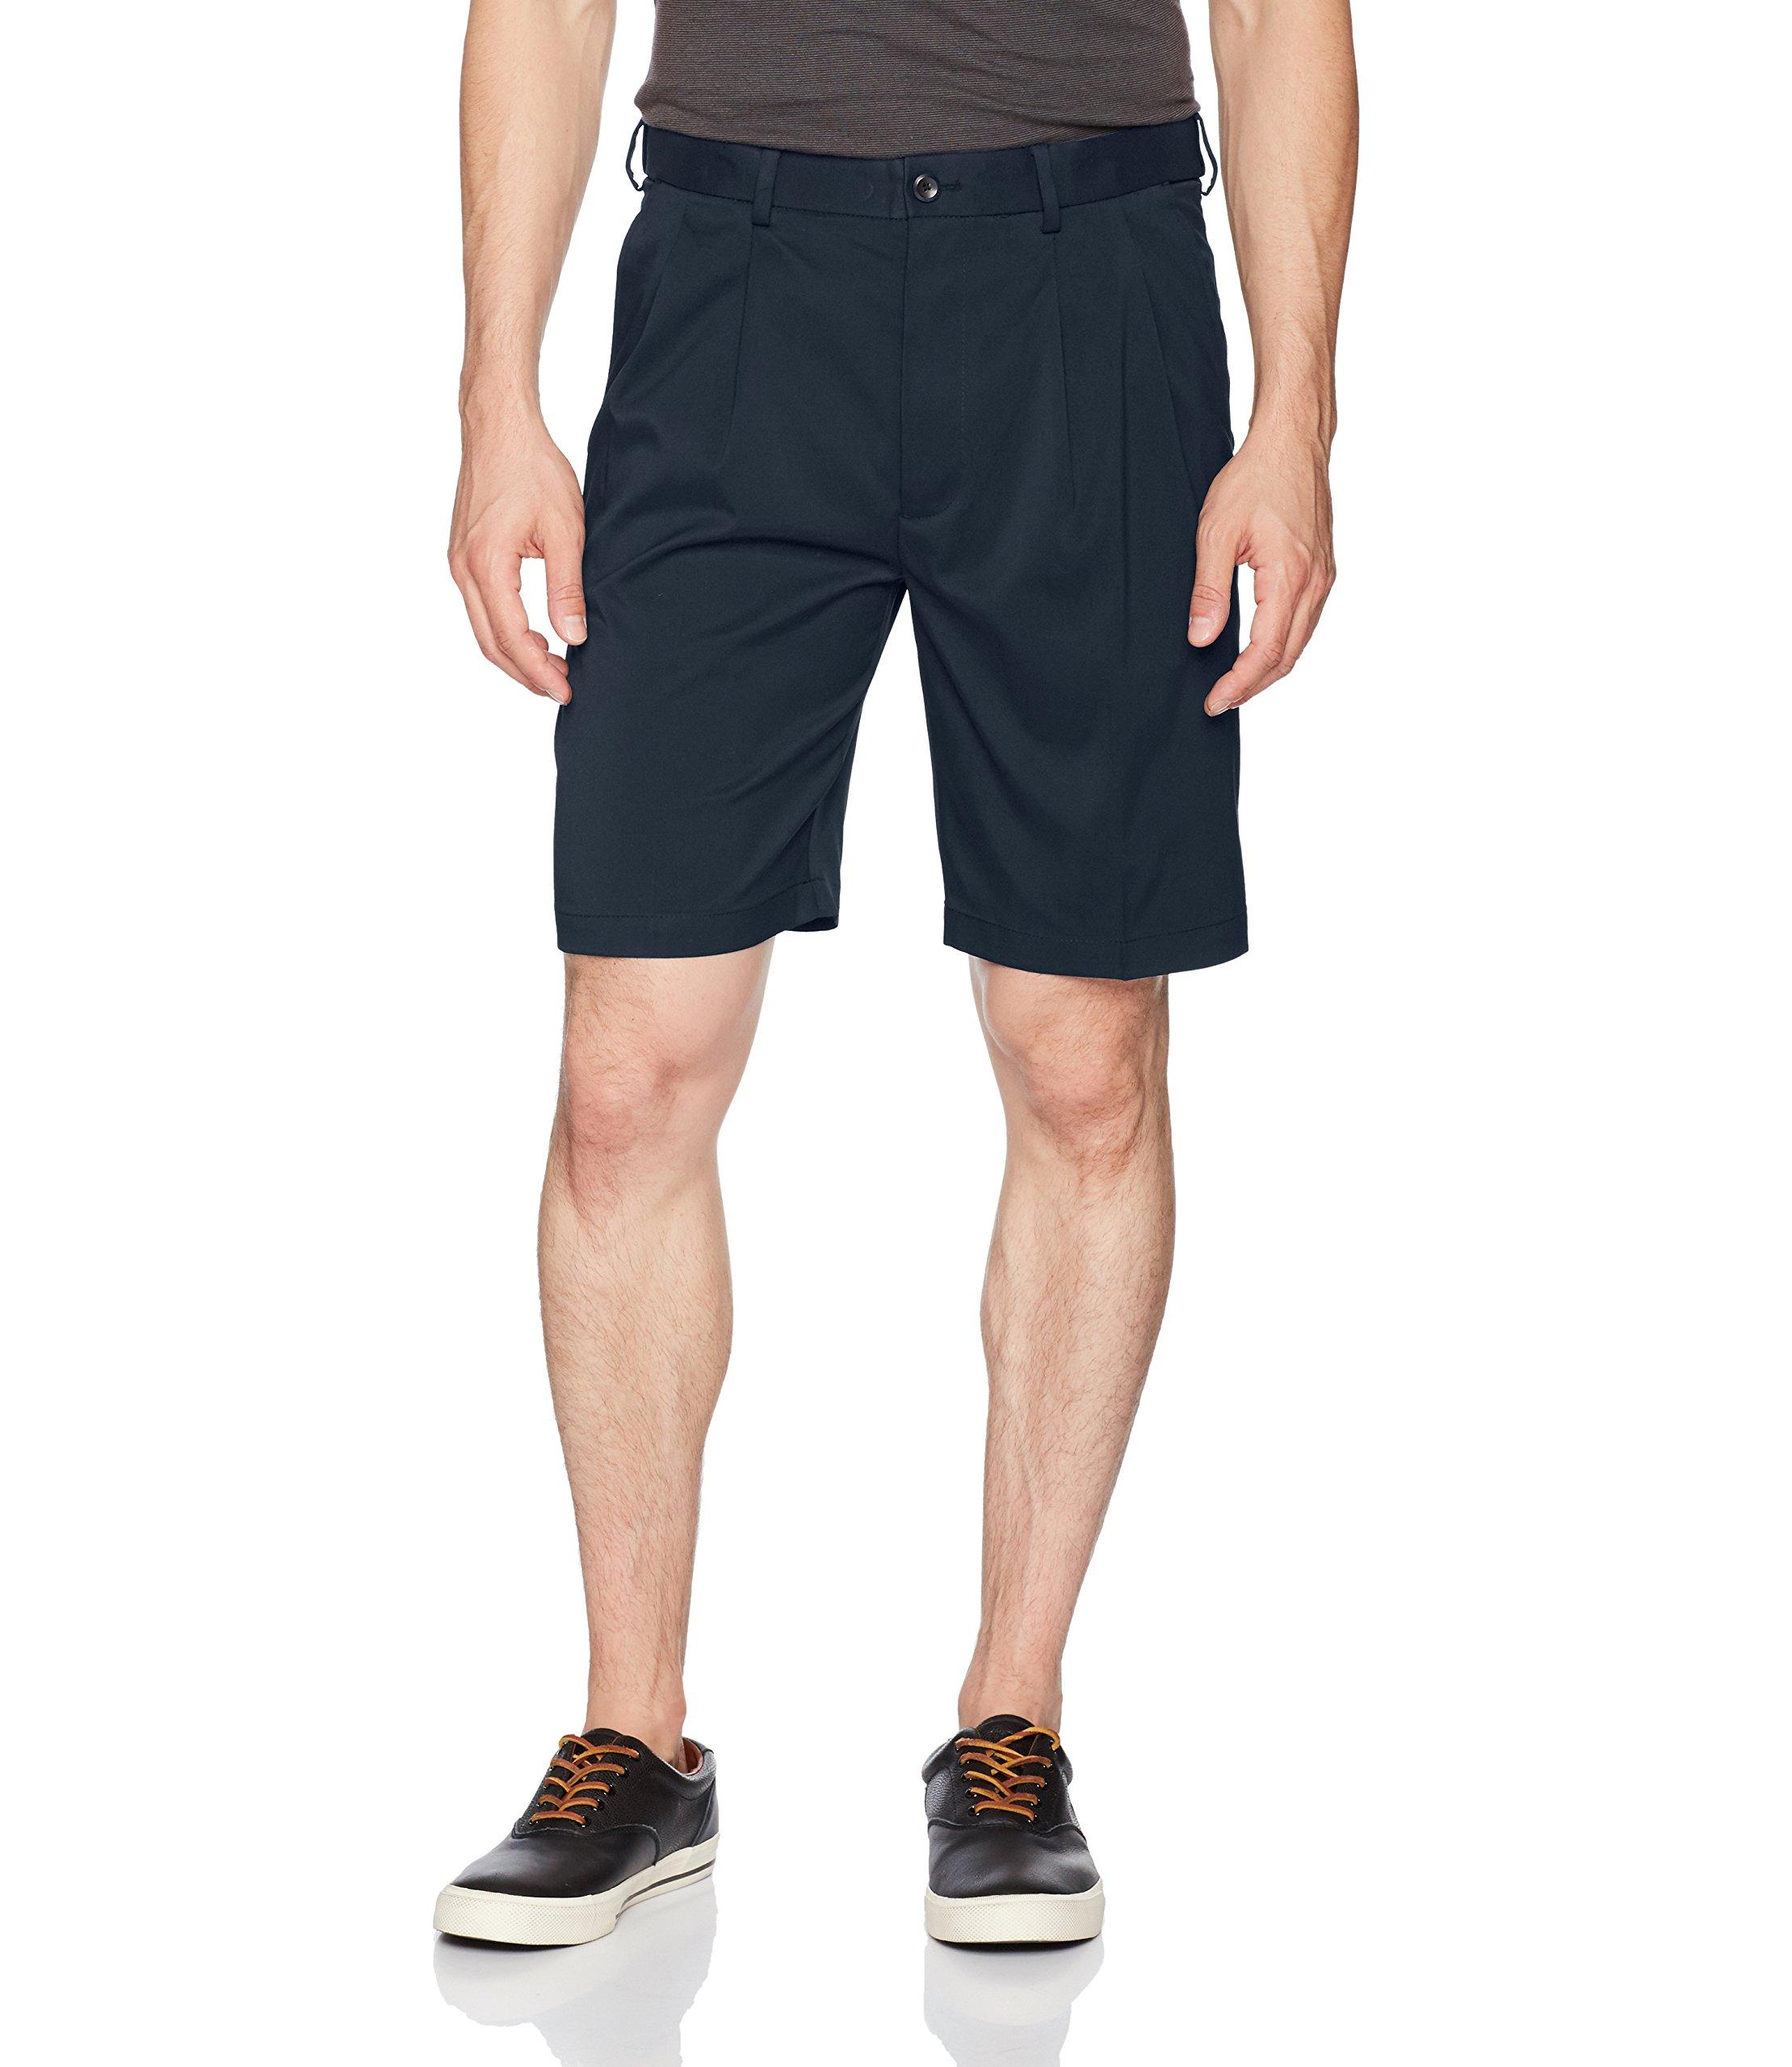 Savane Men's Pleated Mirco Fiber Short, Total Eclipse, 38